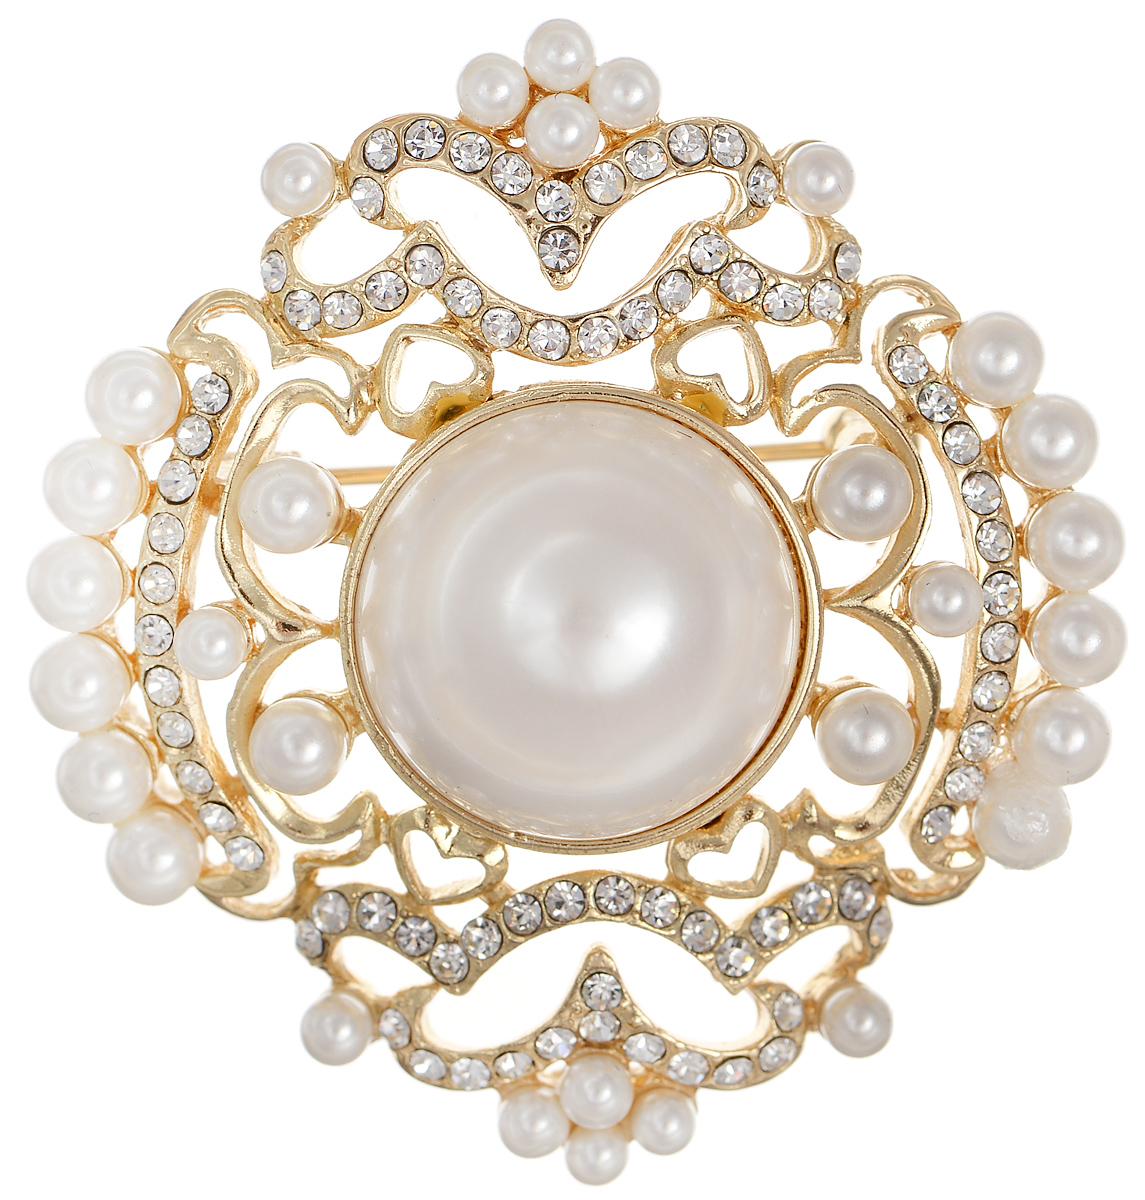 "Брошь Selena ""Street Fashion"", цвет: золотистый, белый. 30026970 Selena Селена"